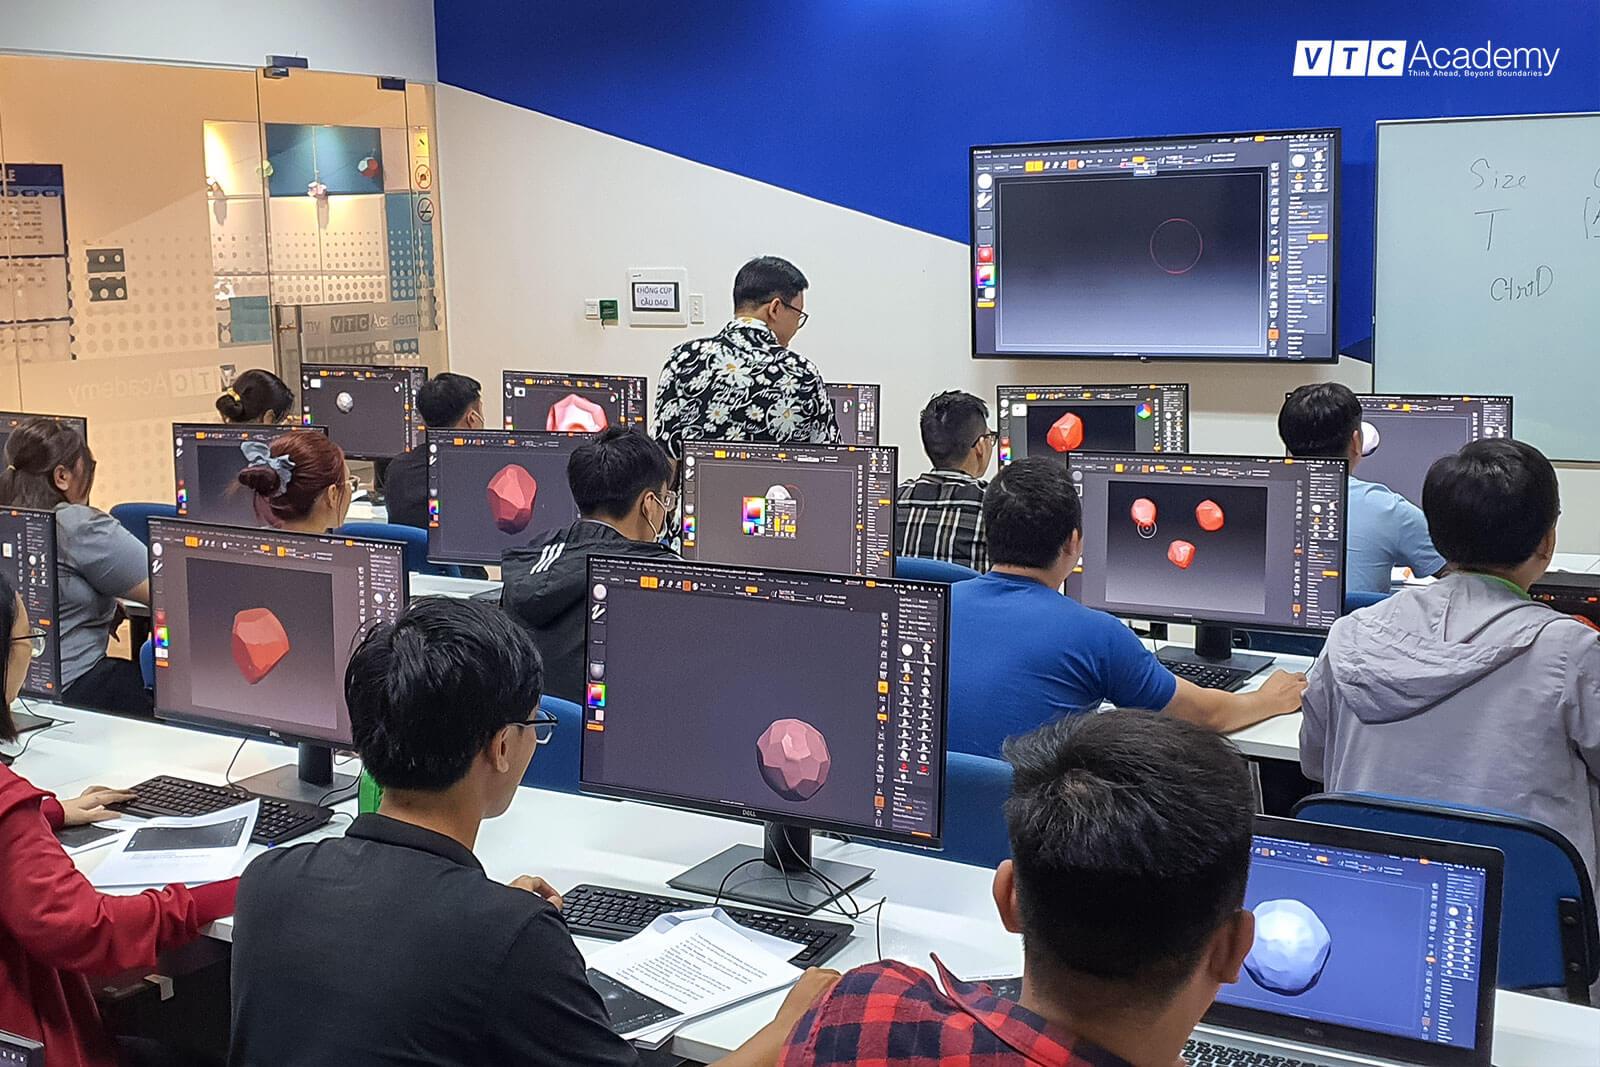 3d-modeling-bootcamp-vtc-academy-8